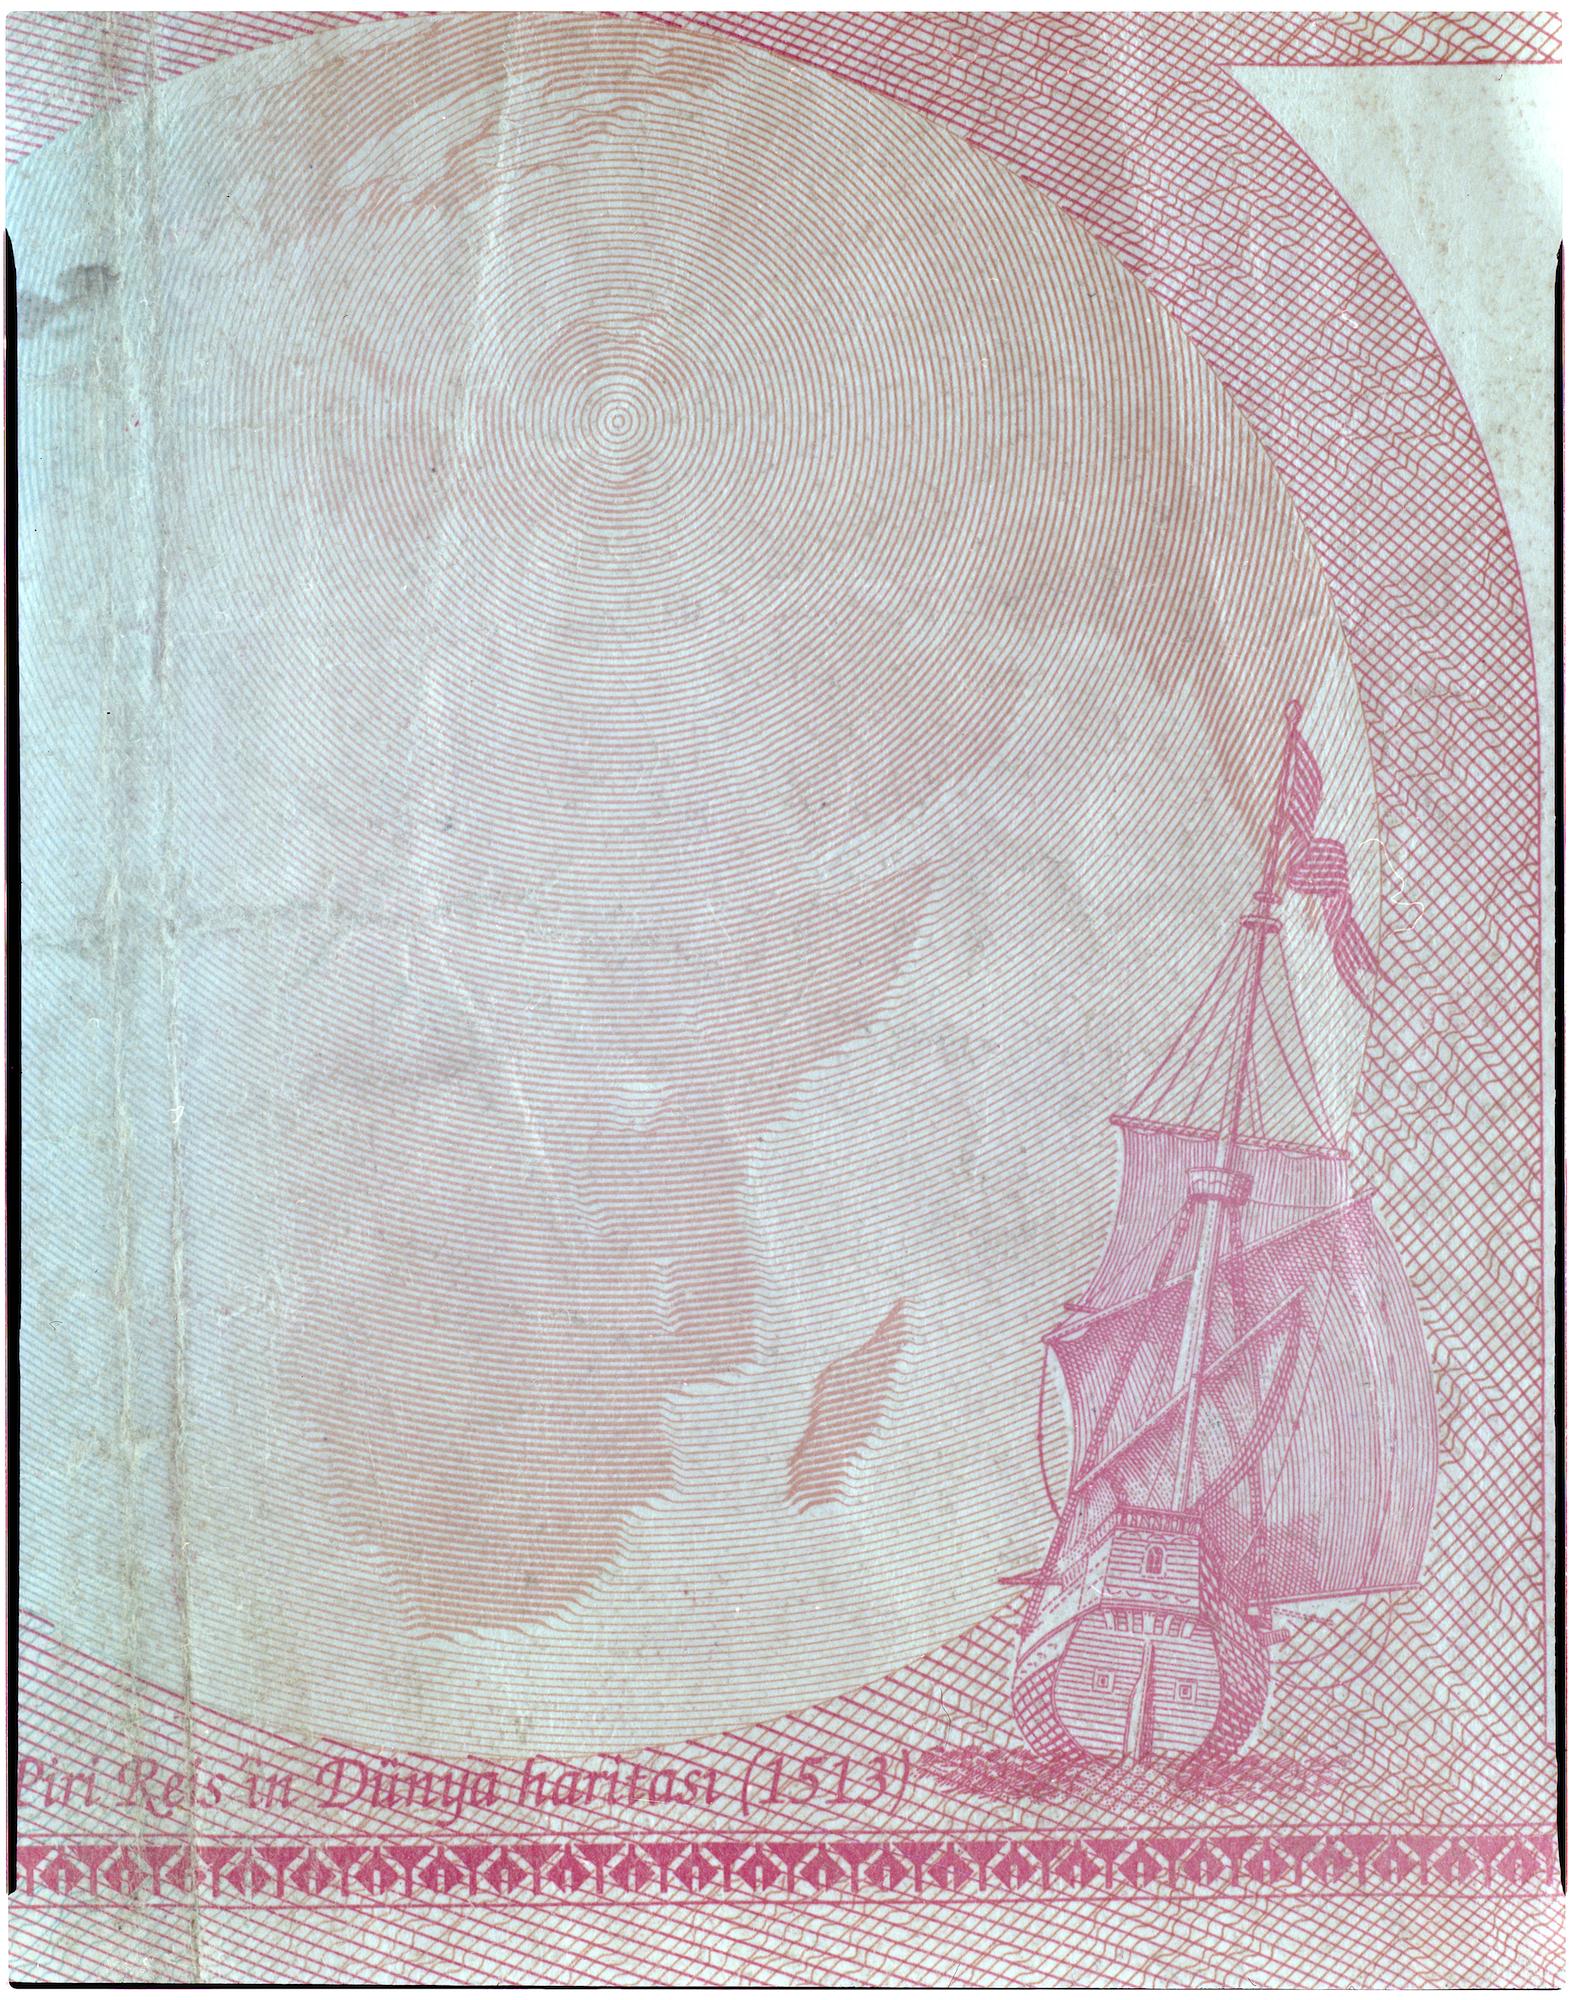 10 Million Turkish Lira - Sailing